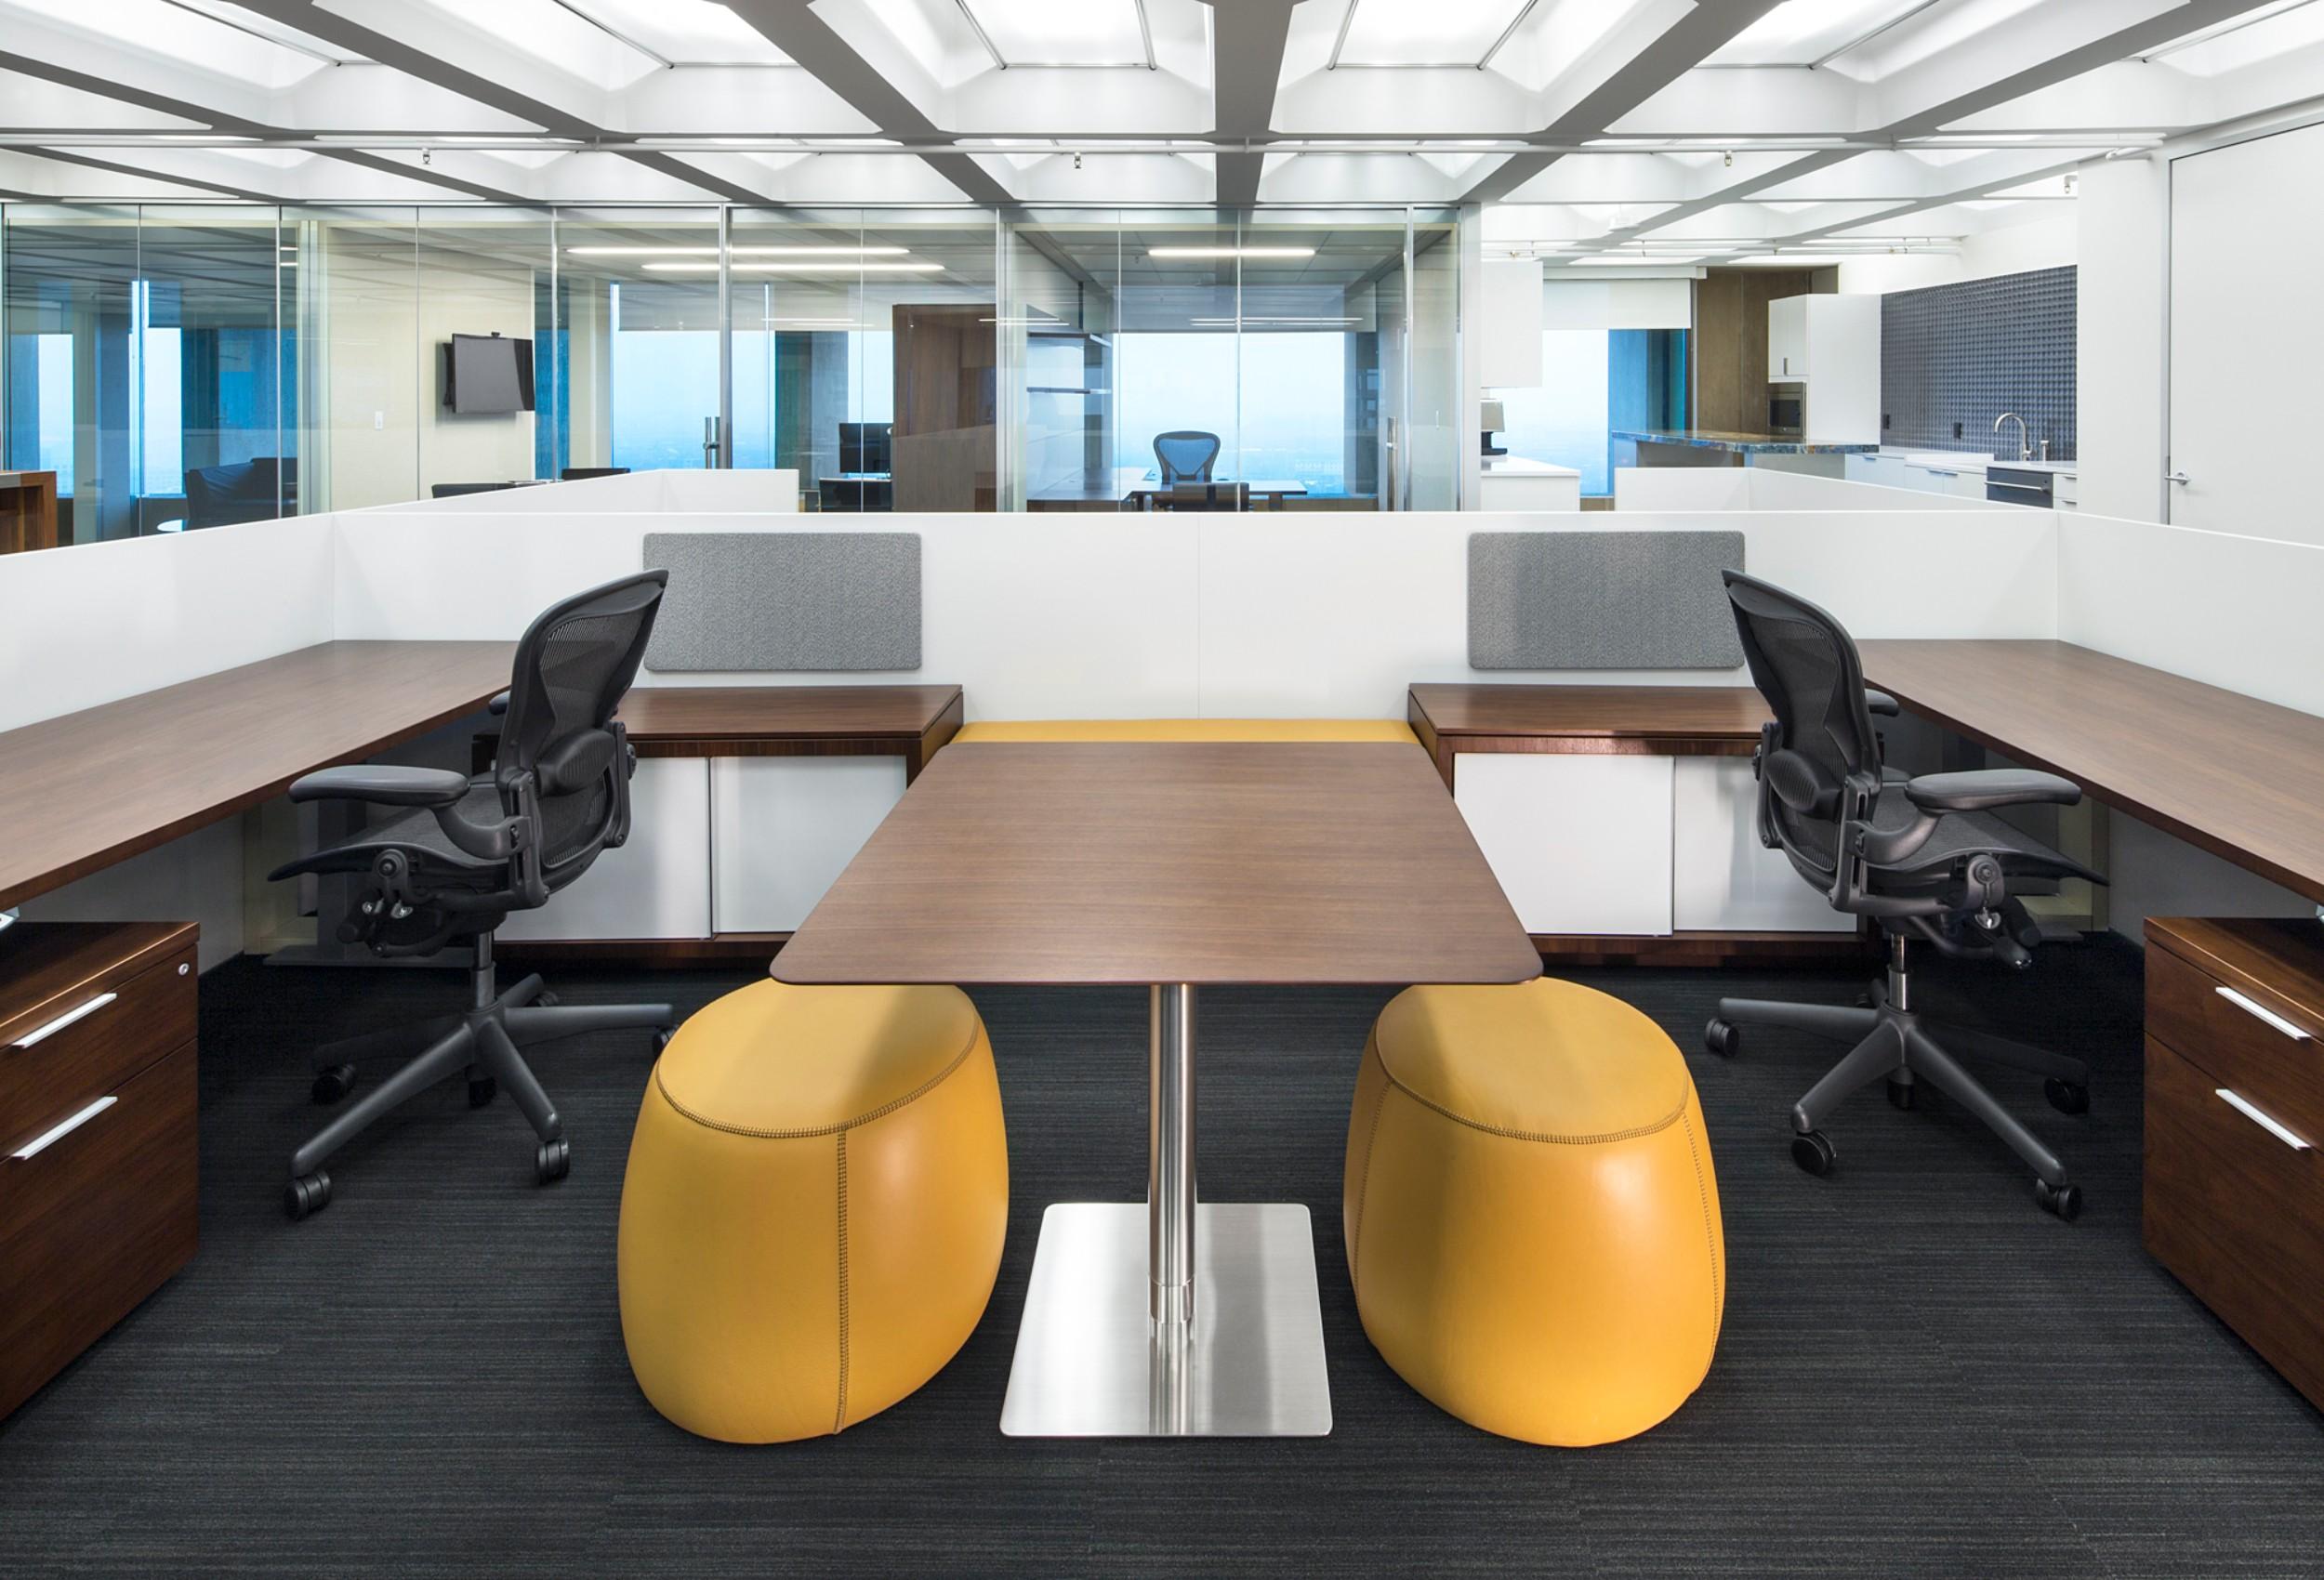 Kensington_Capital_Ventures_Holdings_Corderman_Construction_Office_Finance_Boston_Office_Workstation.jpg